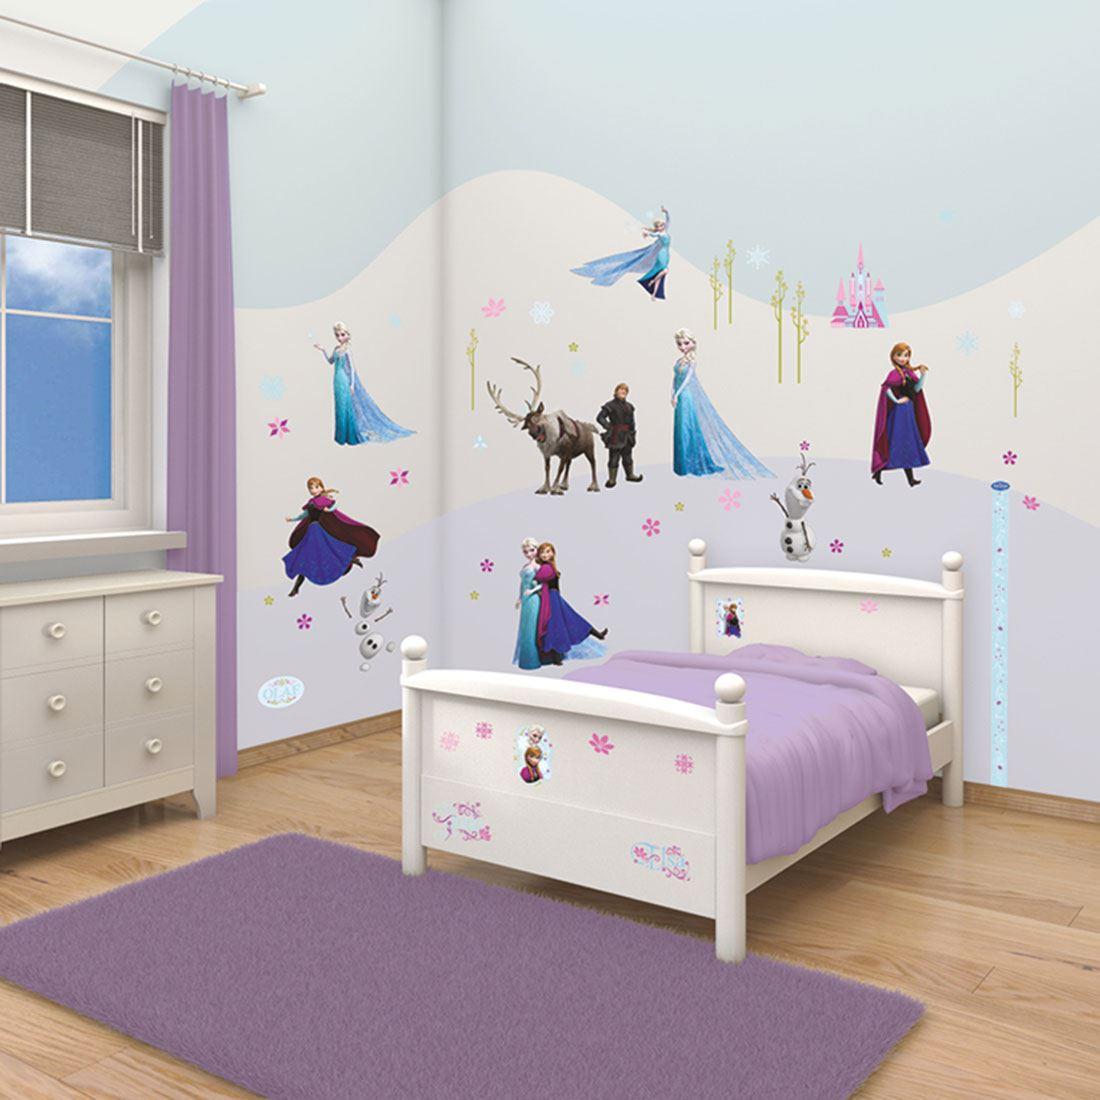 WALLTASTIC WALL STICKER SETS KIDS BEDROOM CHOOSE FROM